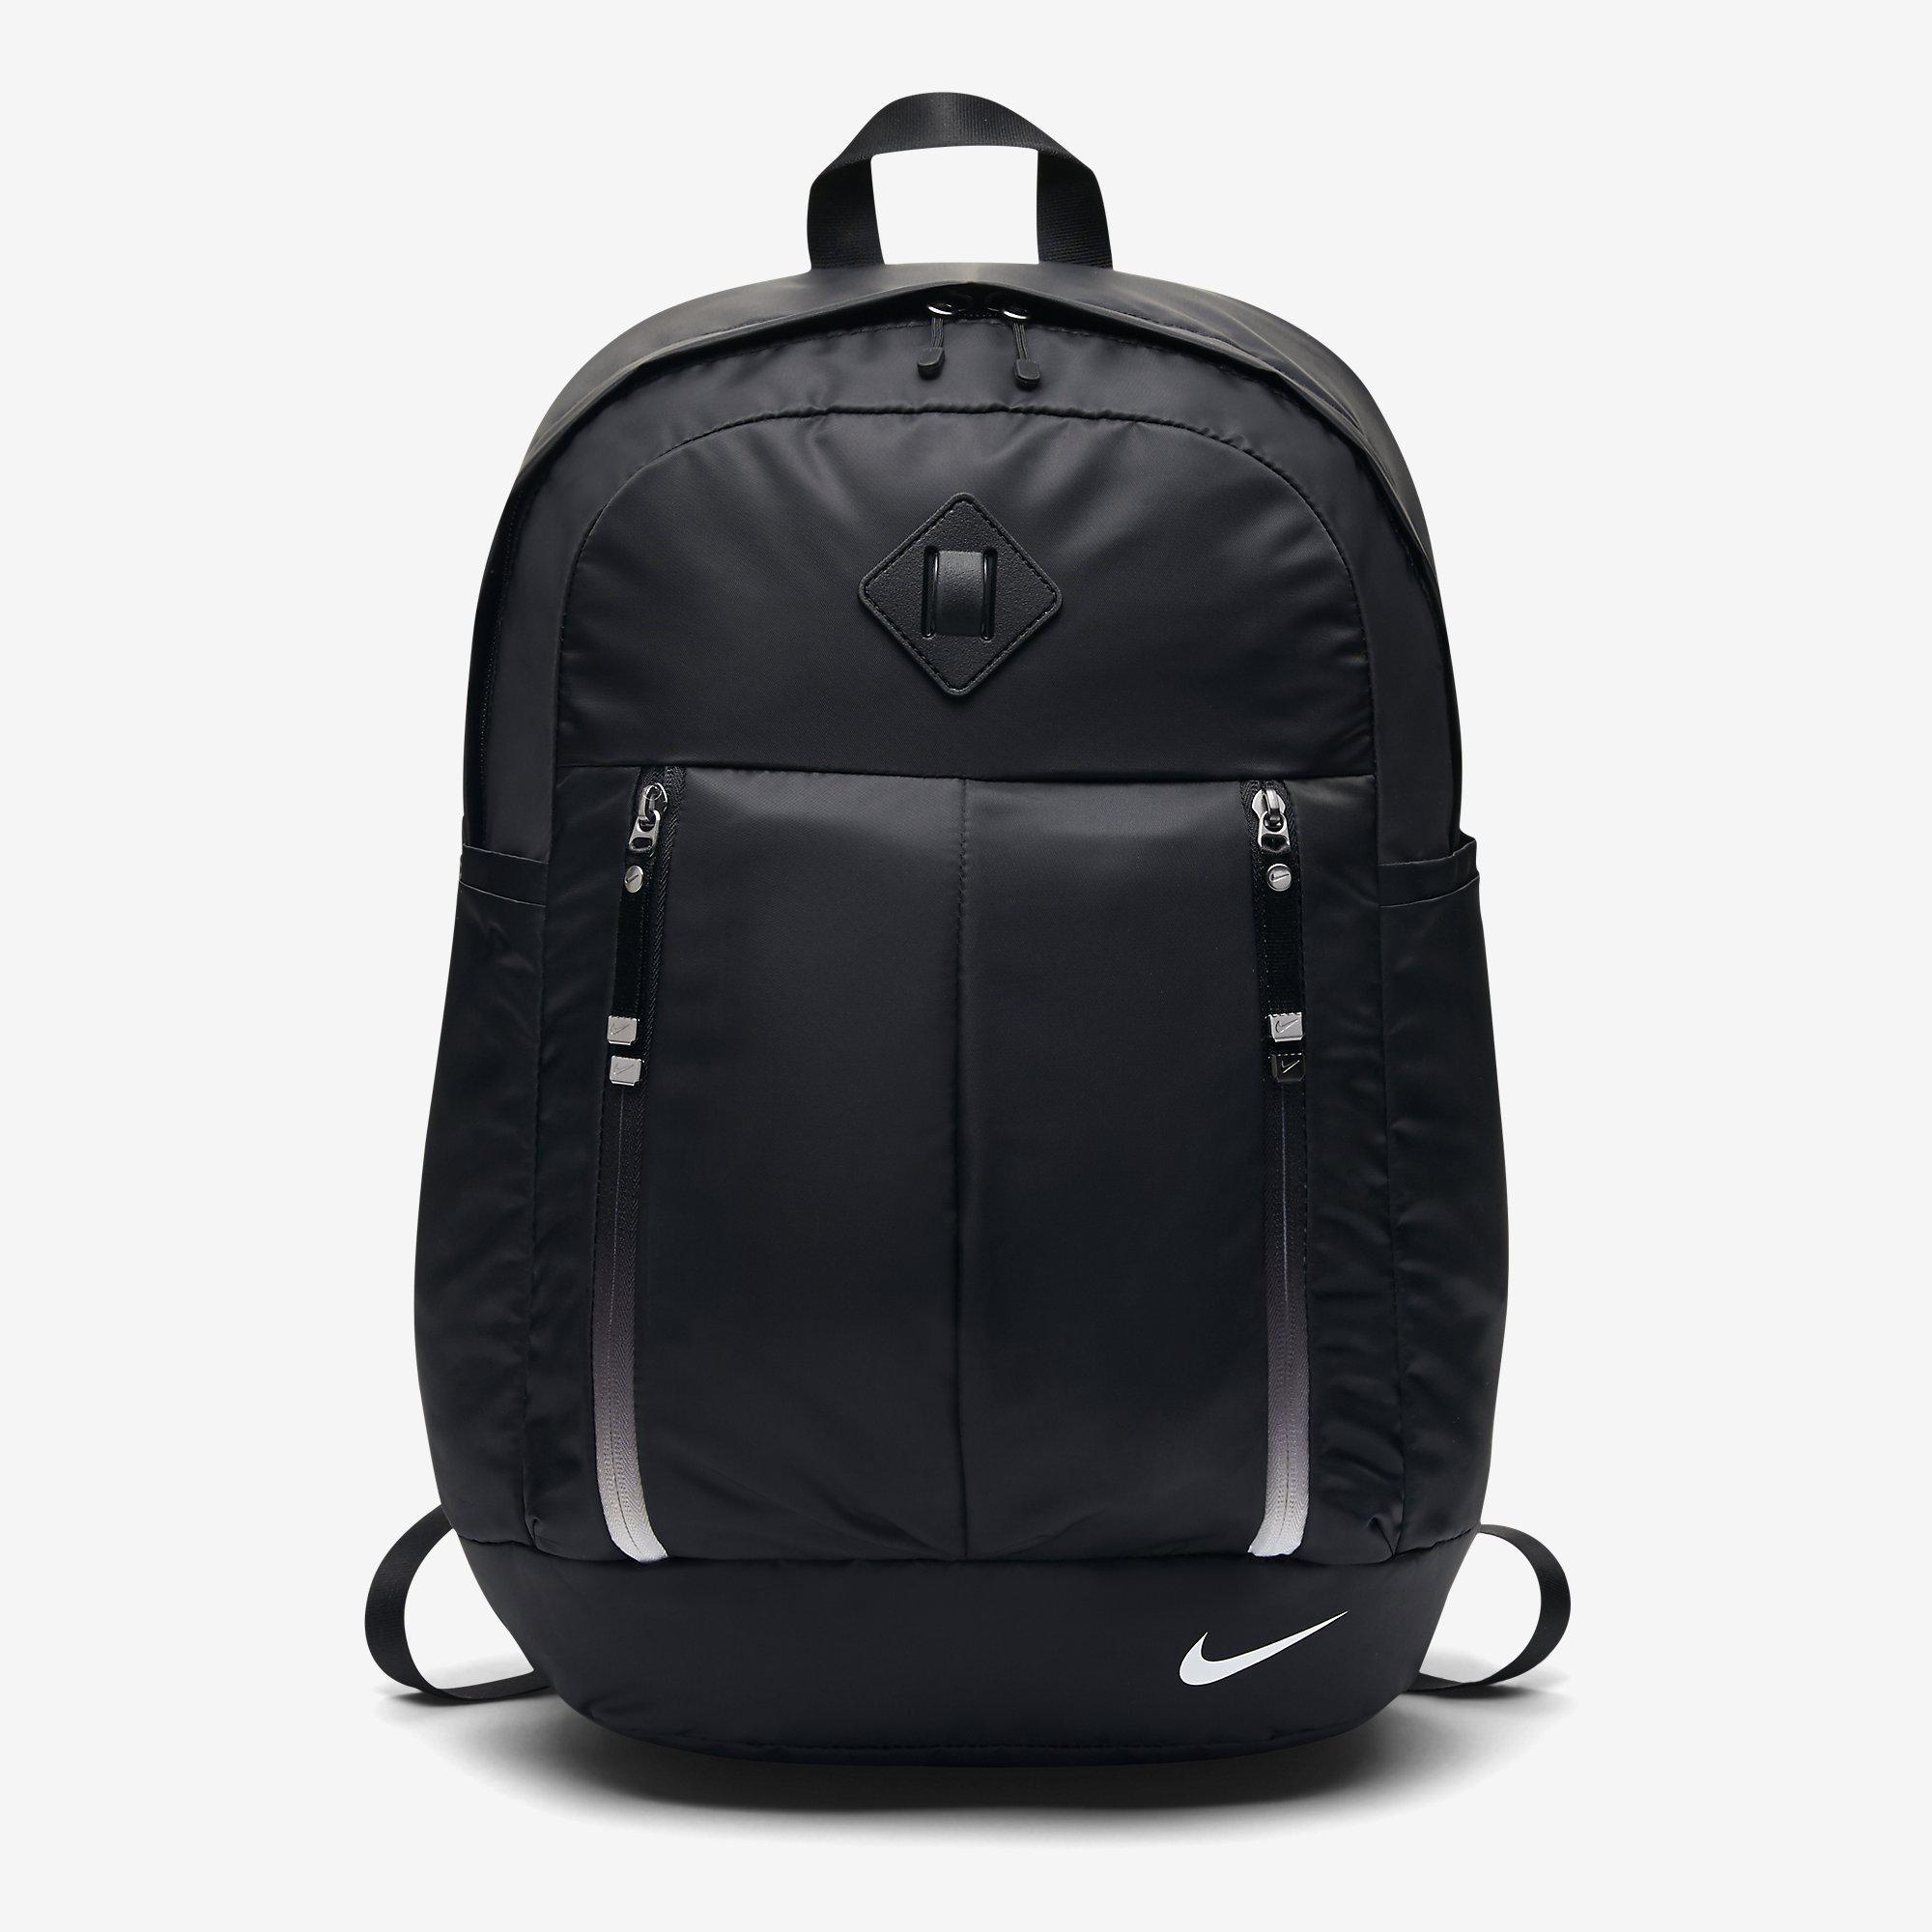 89729aec80 Nike Womens Auralux Training Backpack - Black White - Tennisnuts.com